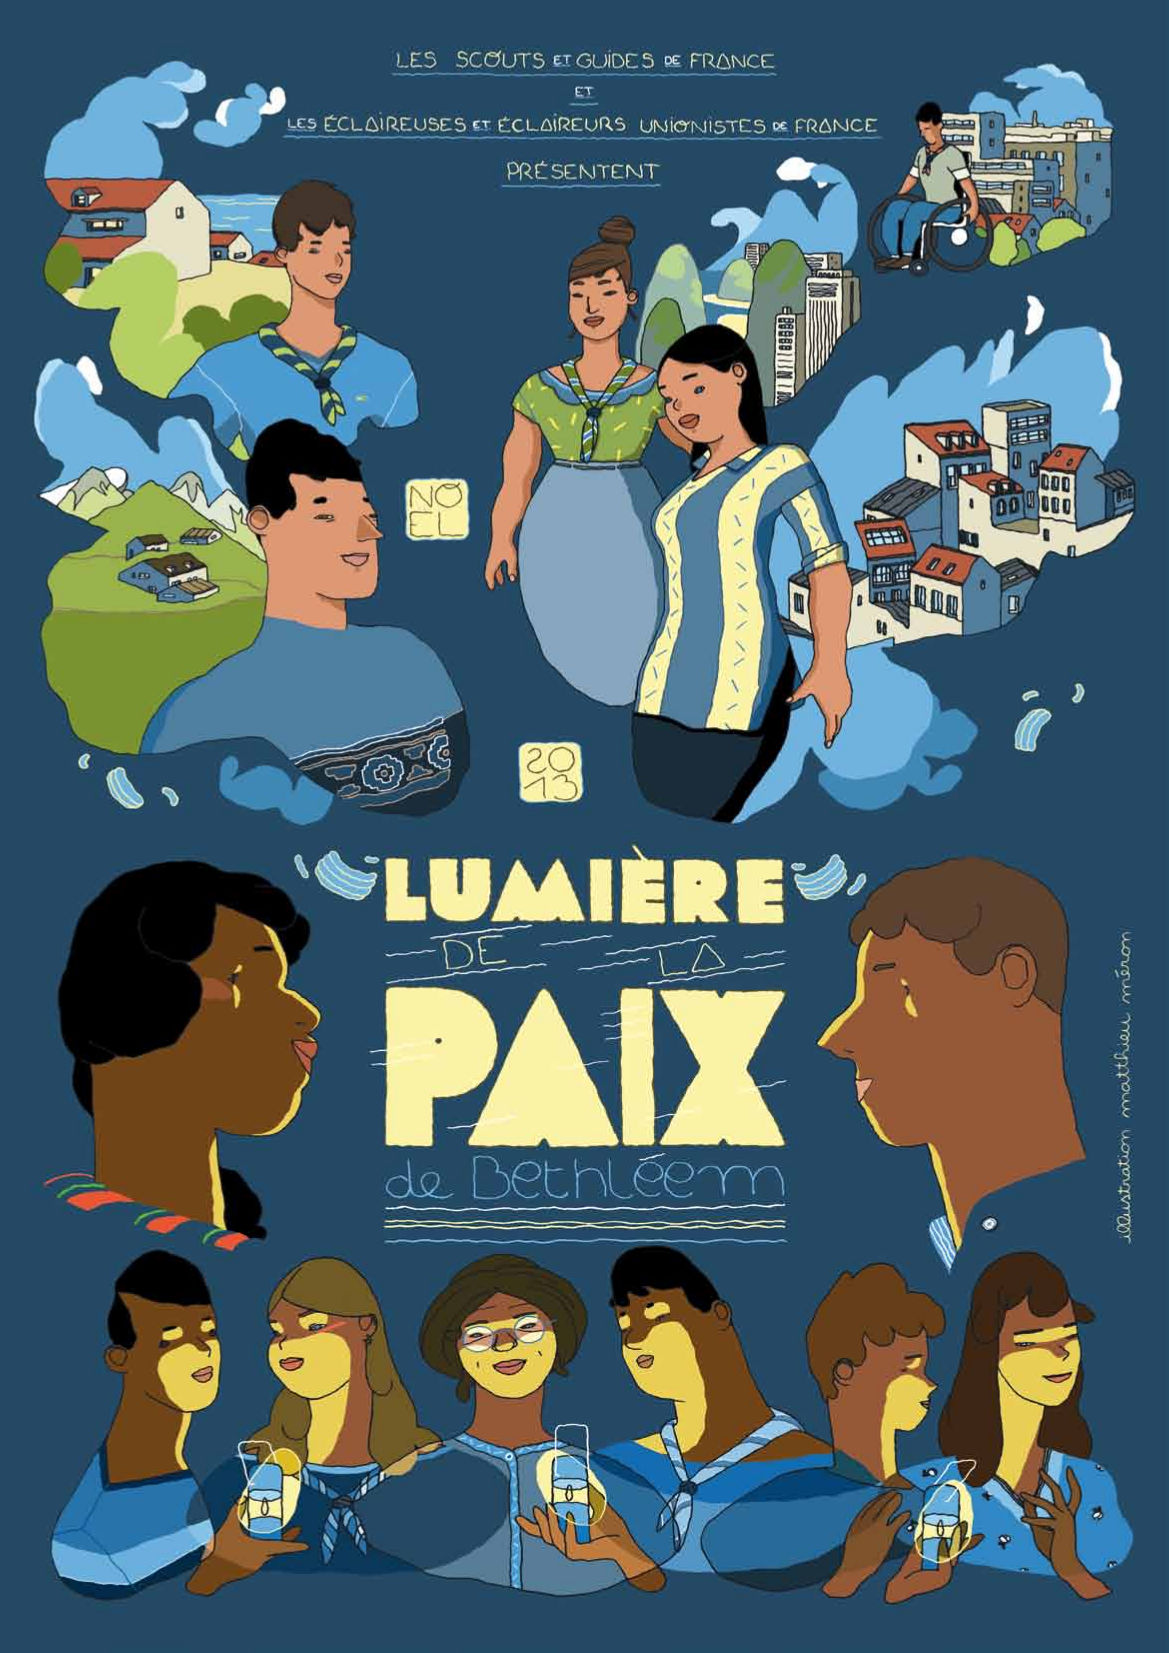 LumPaix_Affiche2013